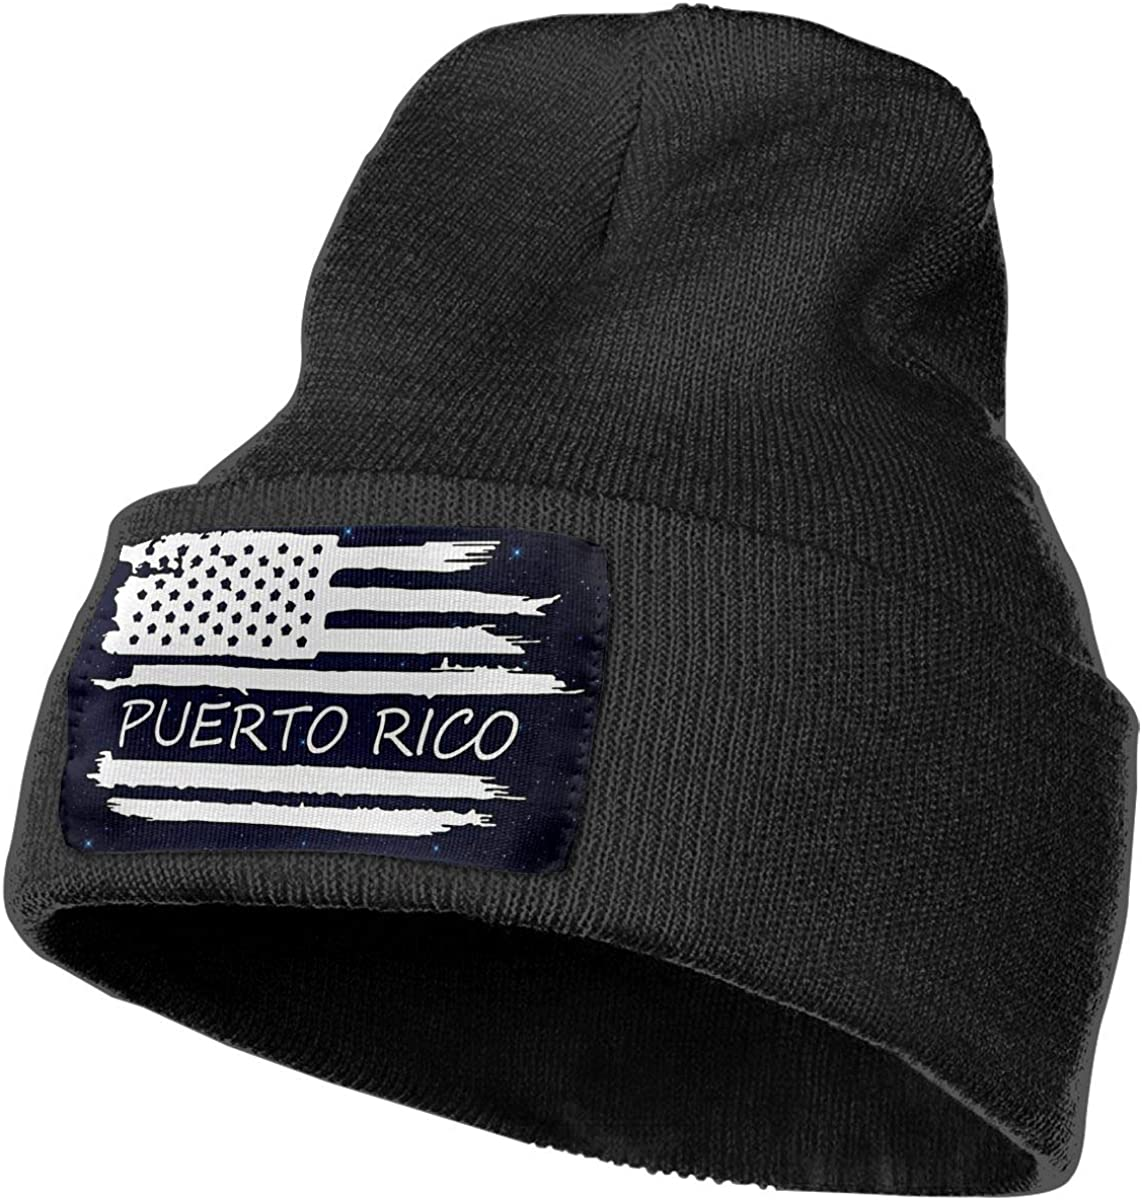 Stretchy /& Soft Winter Ski Skull Cap American Flag Puerto Rico Flag Men /& Women Solid Color Knit Beanie Hat